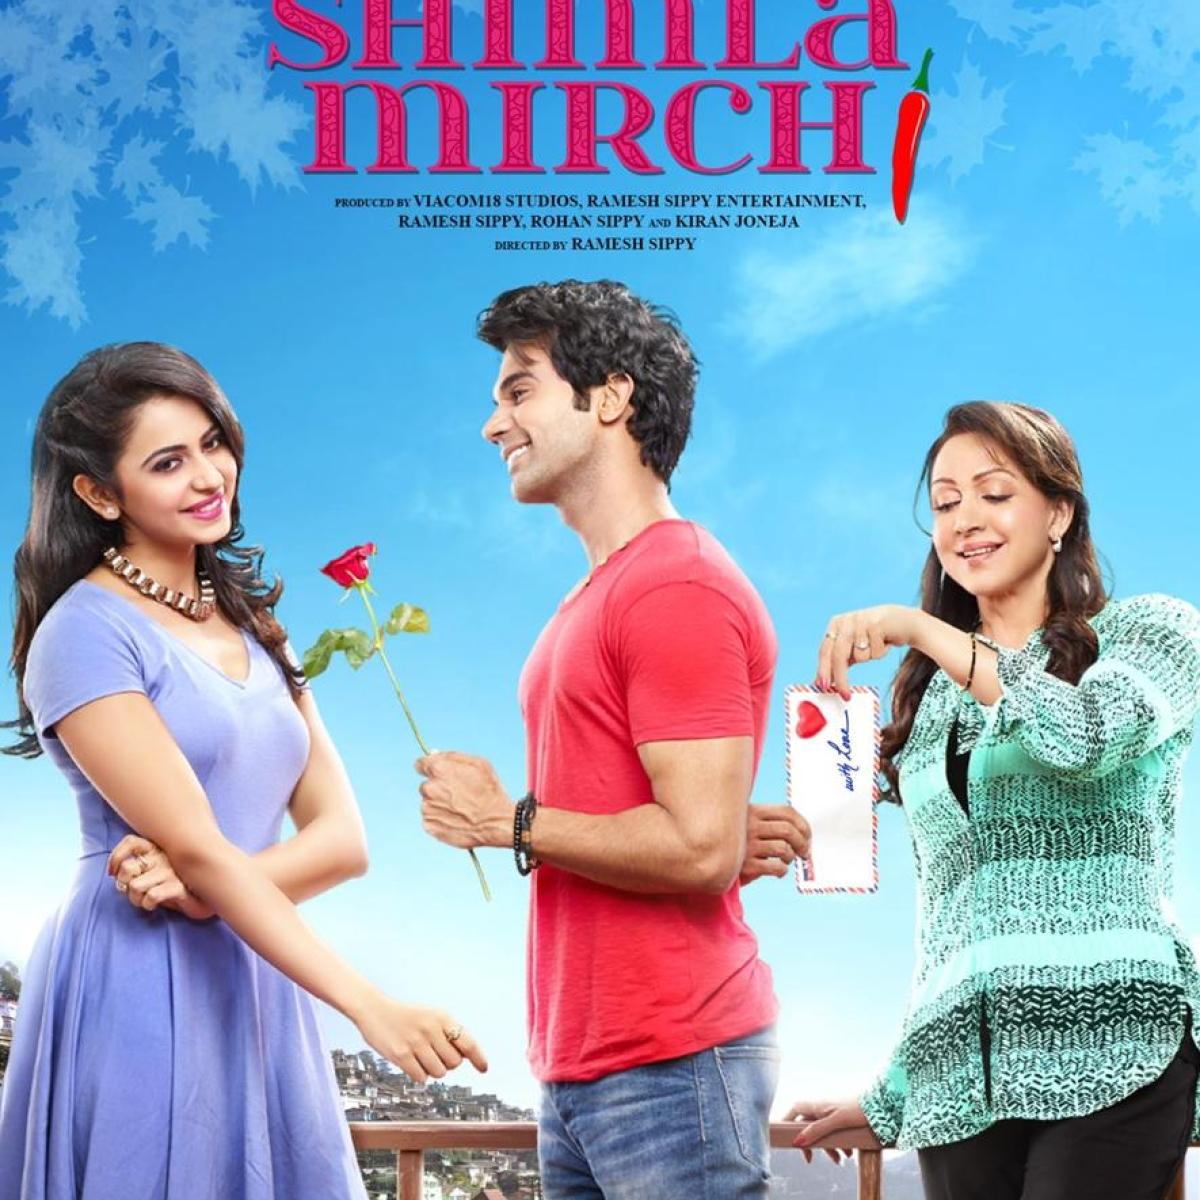 Rajkummar Rao and Rakul Preet Singh to finally taste 'Shimla Mirchi' after 5 years